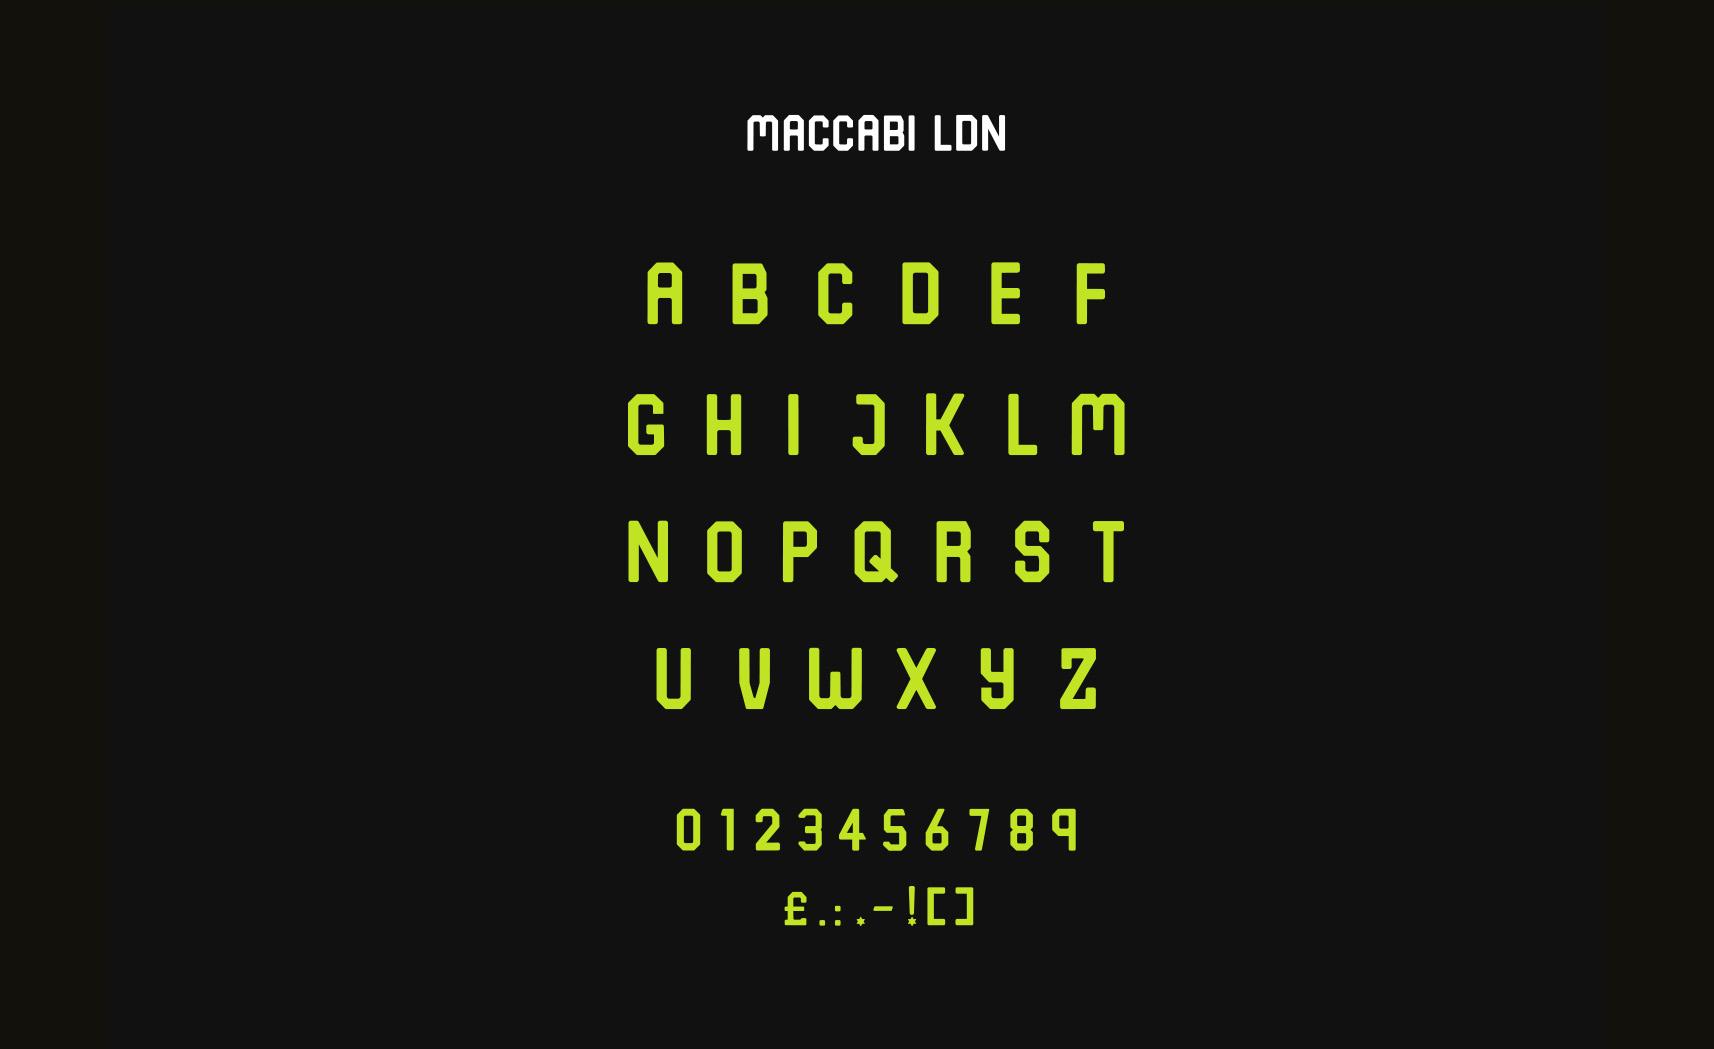 Maccabi_LDN_Typeface